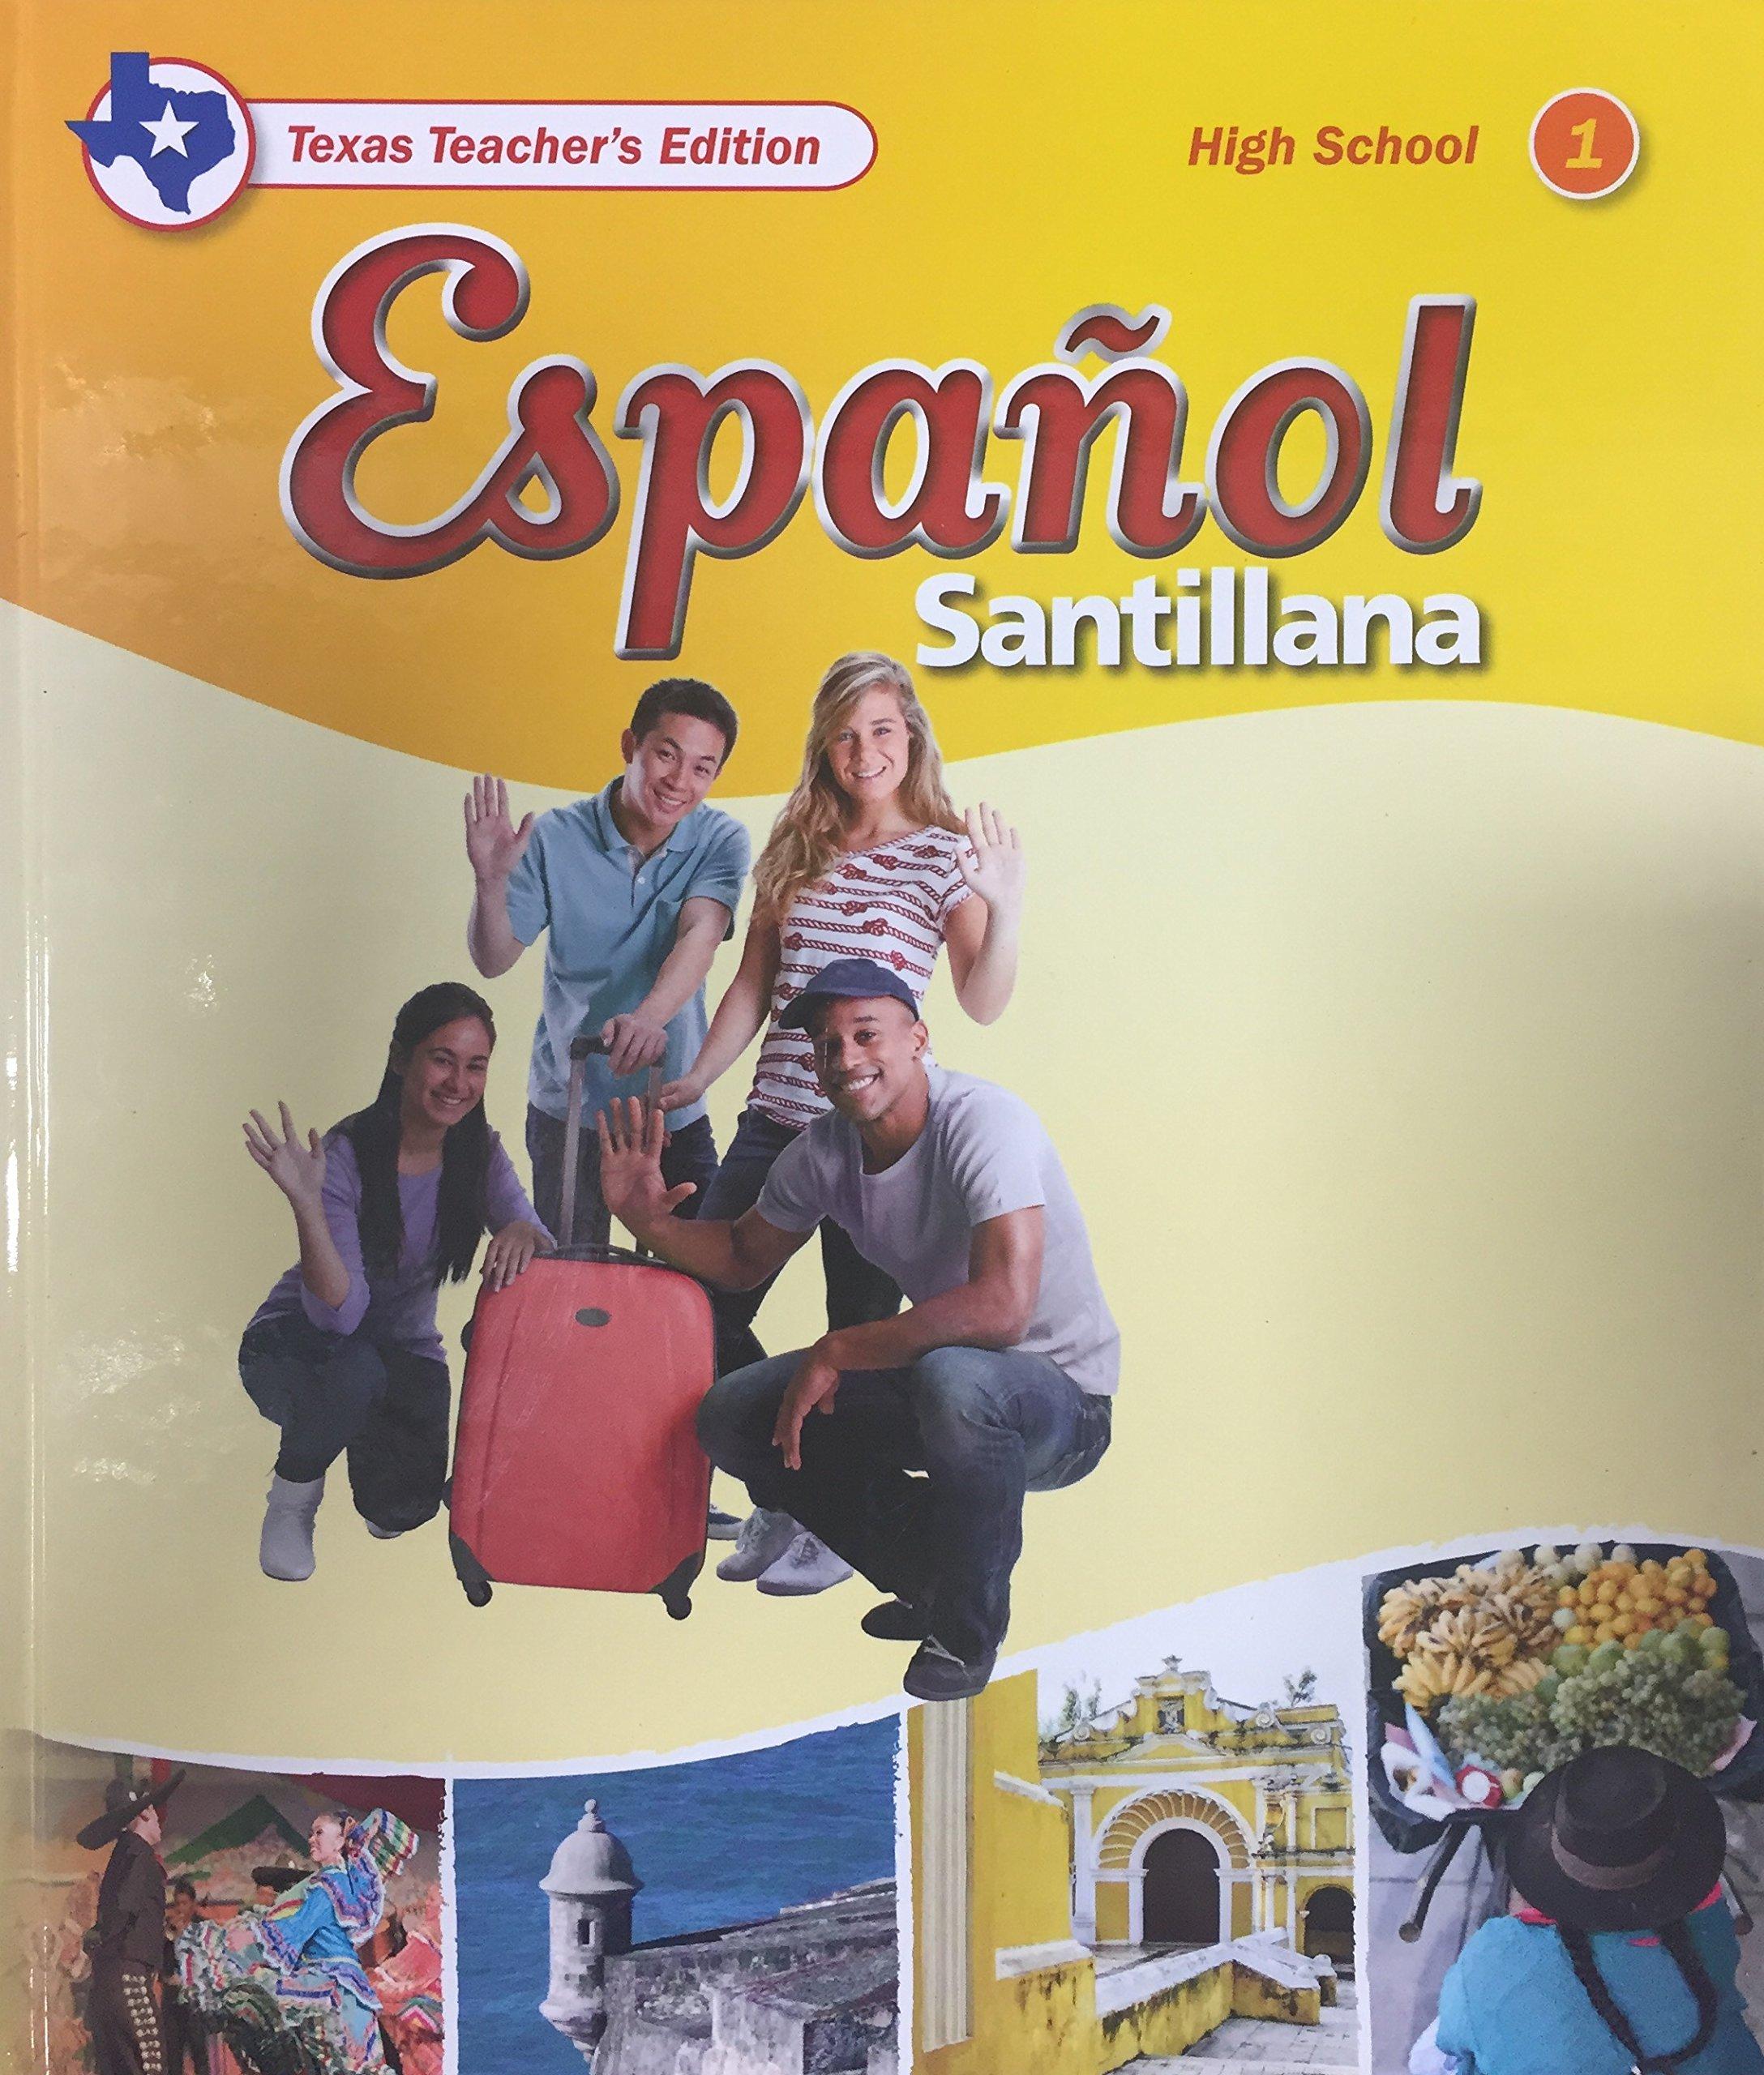 Espanol Santillana, High School 1 - Texas Teacher's Edition PDF